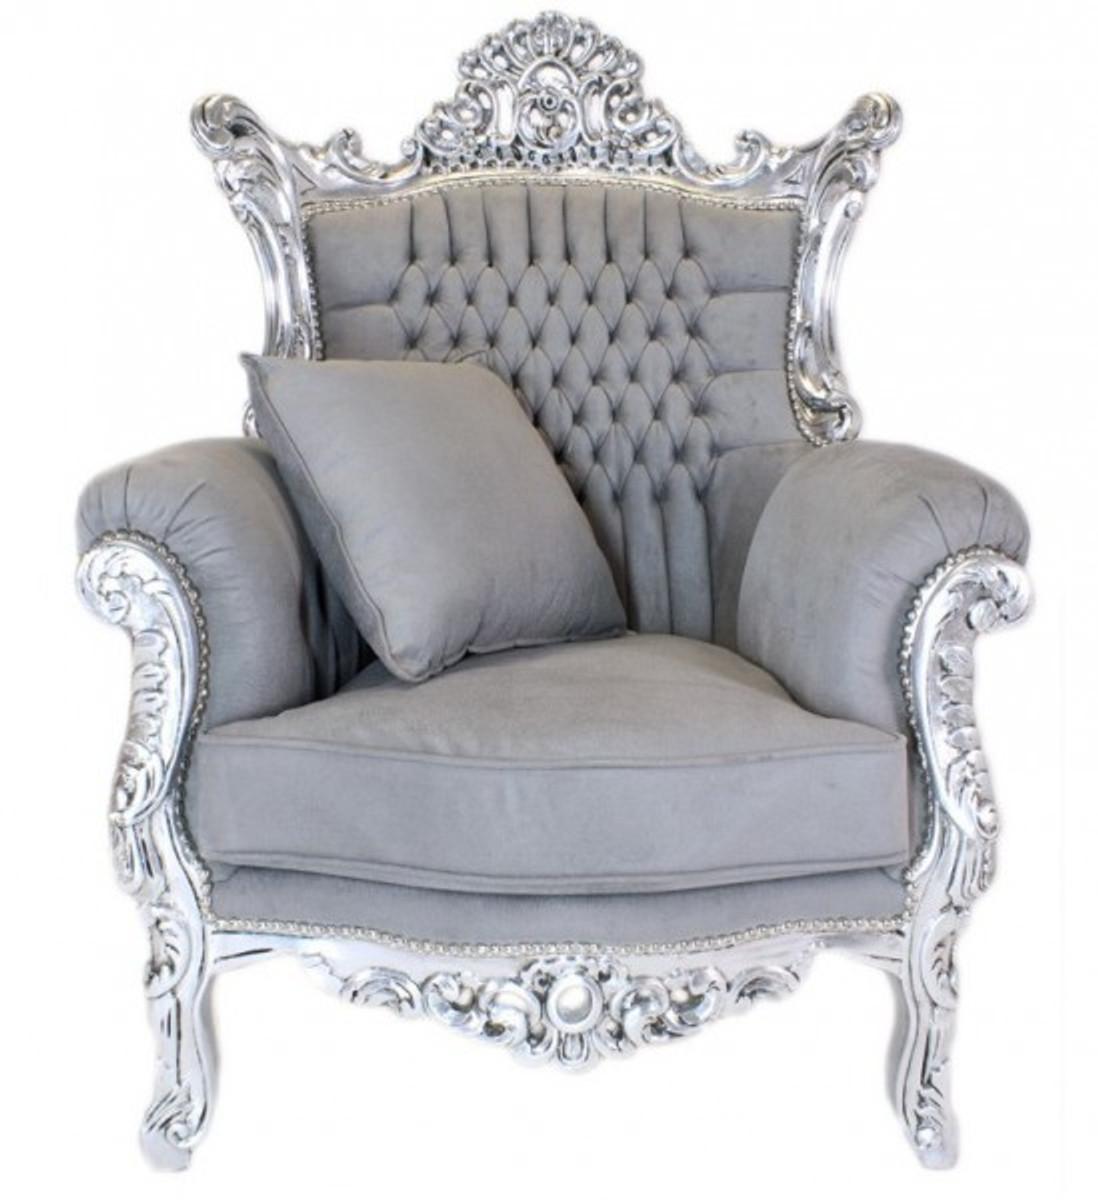 casa padrino barock wohnzimmer set master grau silber 2er sofa 2 sessel sofa sets